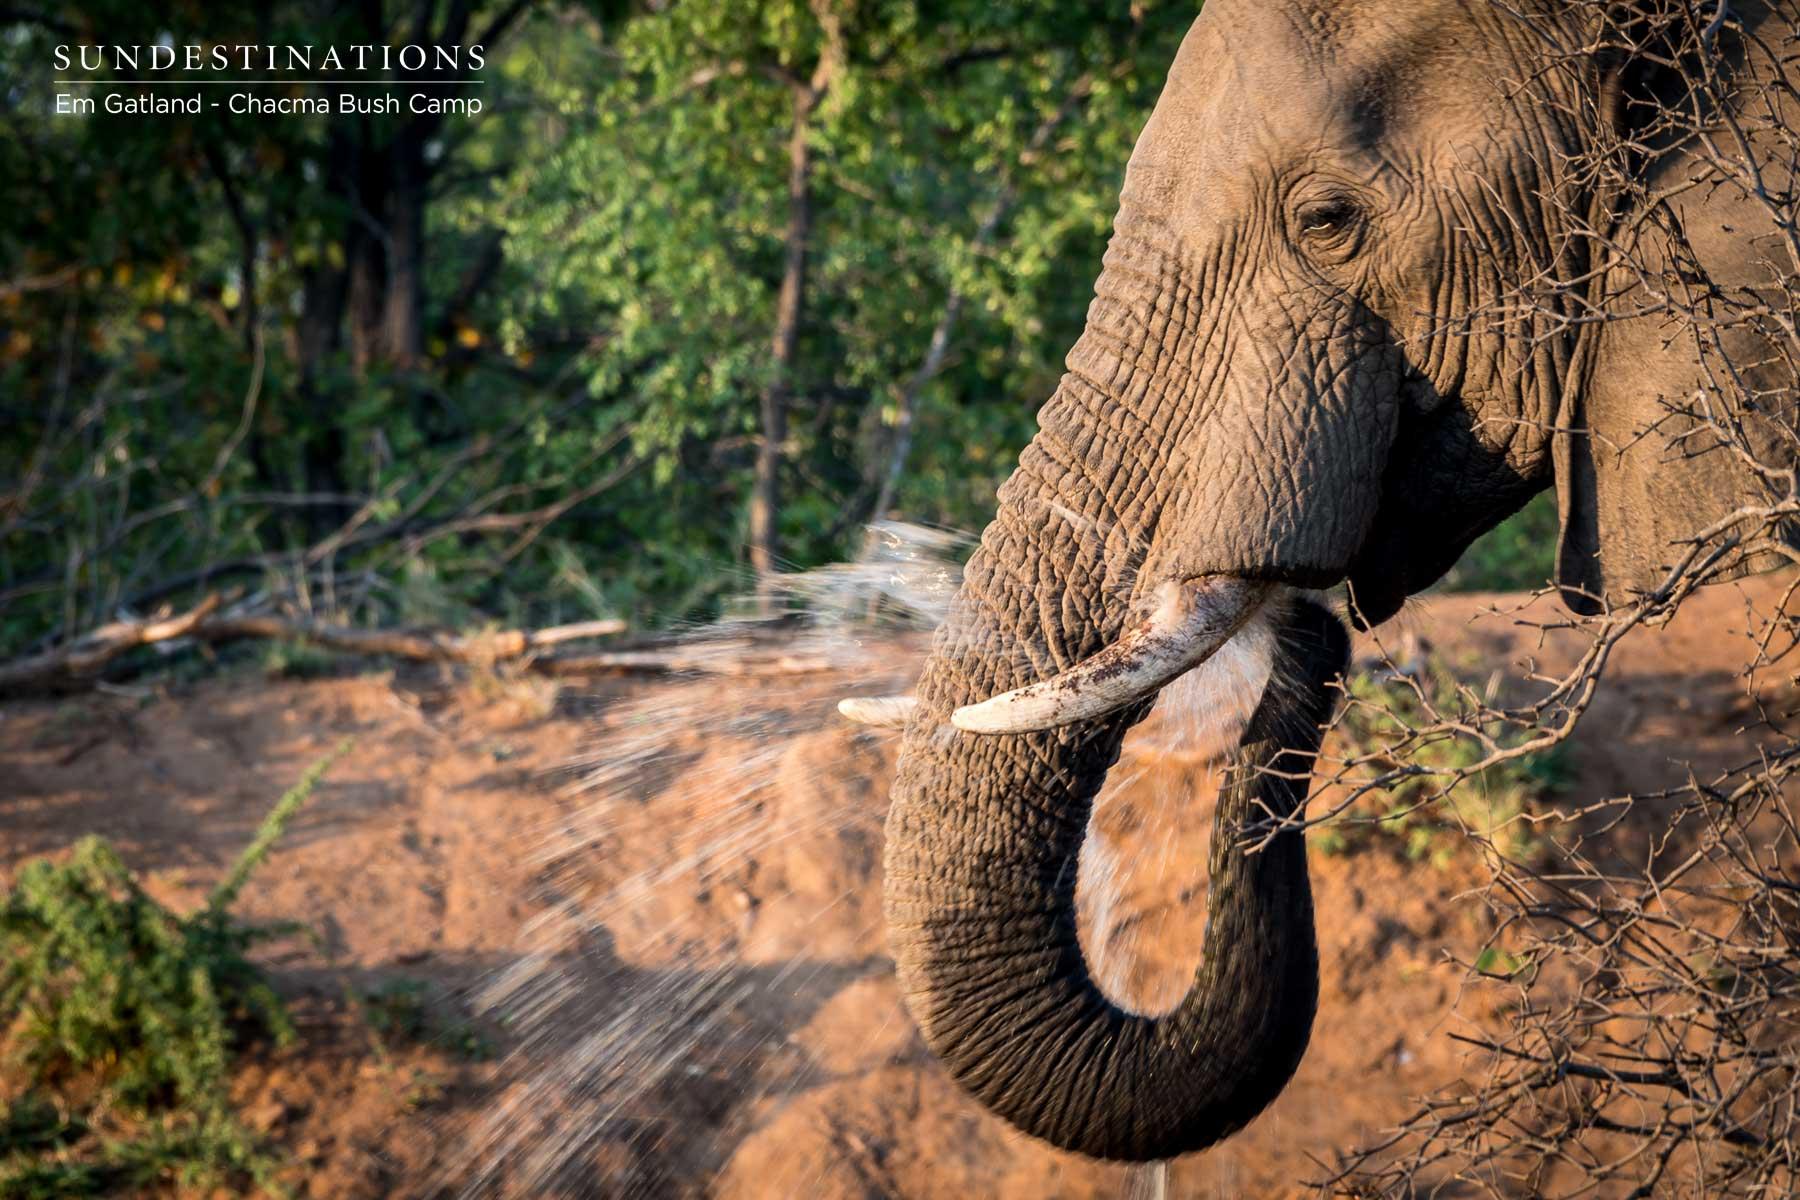 Chacma Elephant Tusk